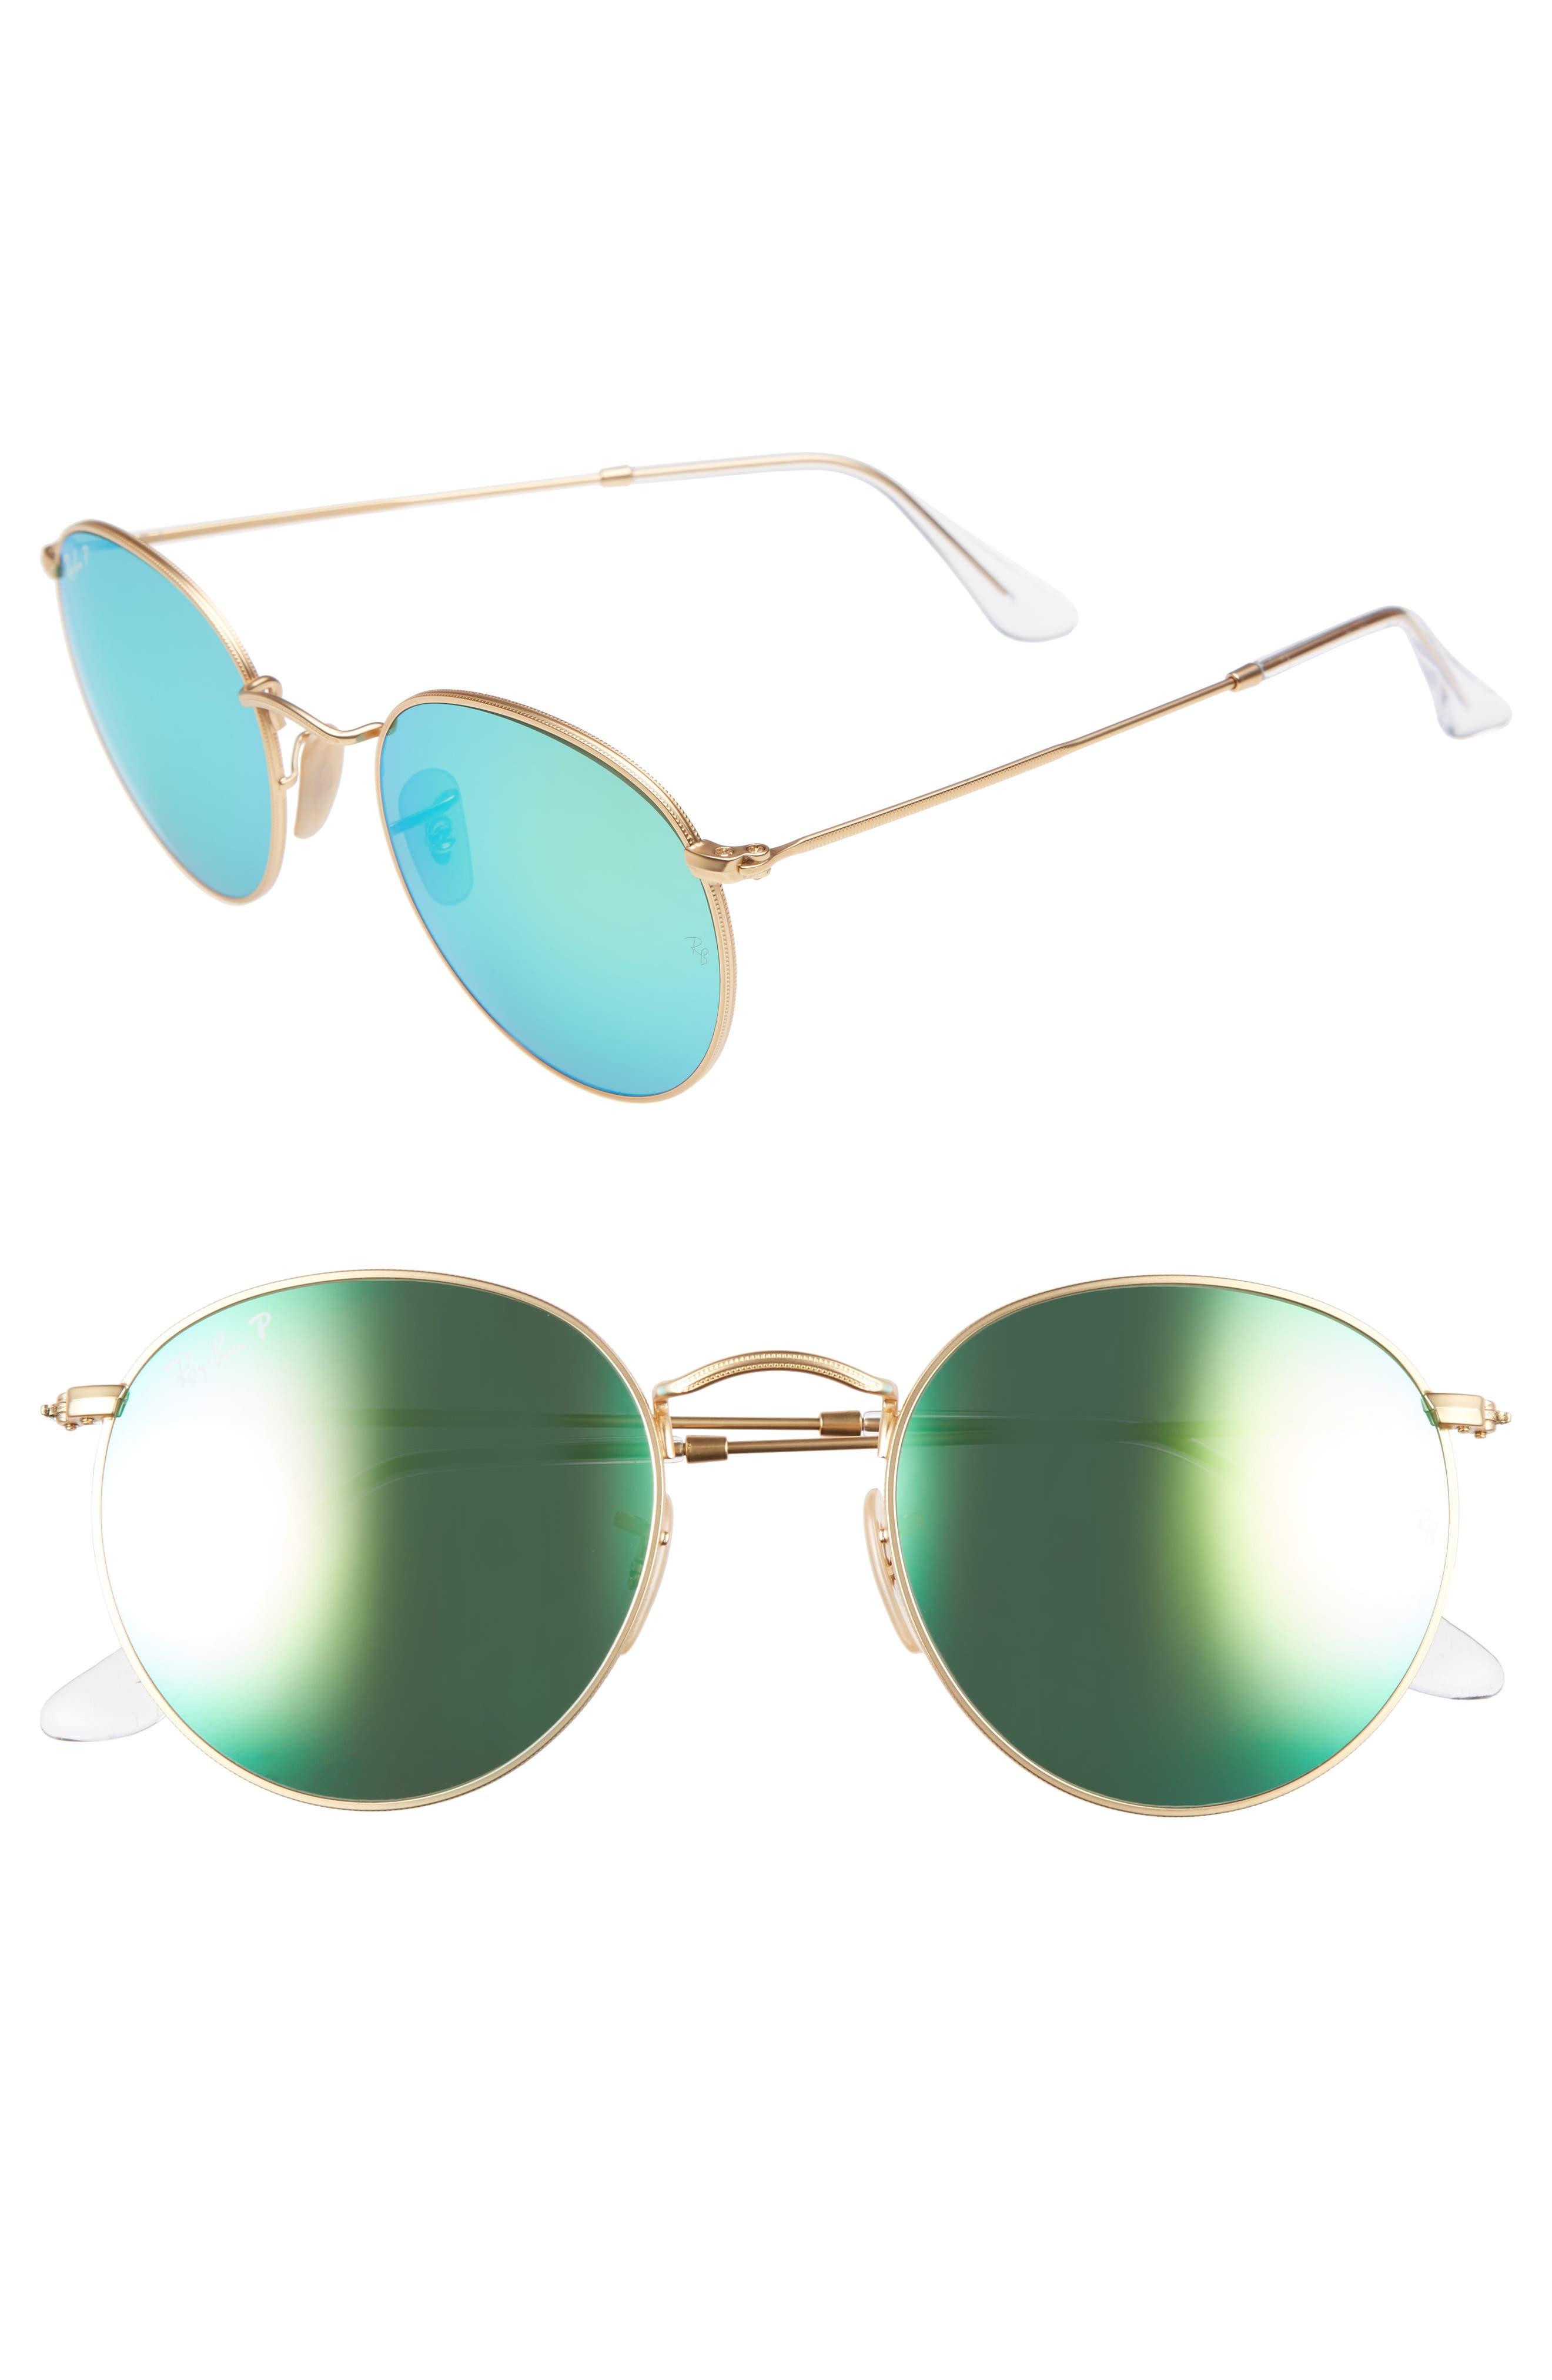 Ray-Ban 53mm Polarized Round Retro Sunglasses